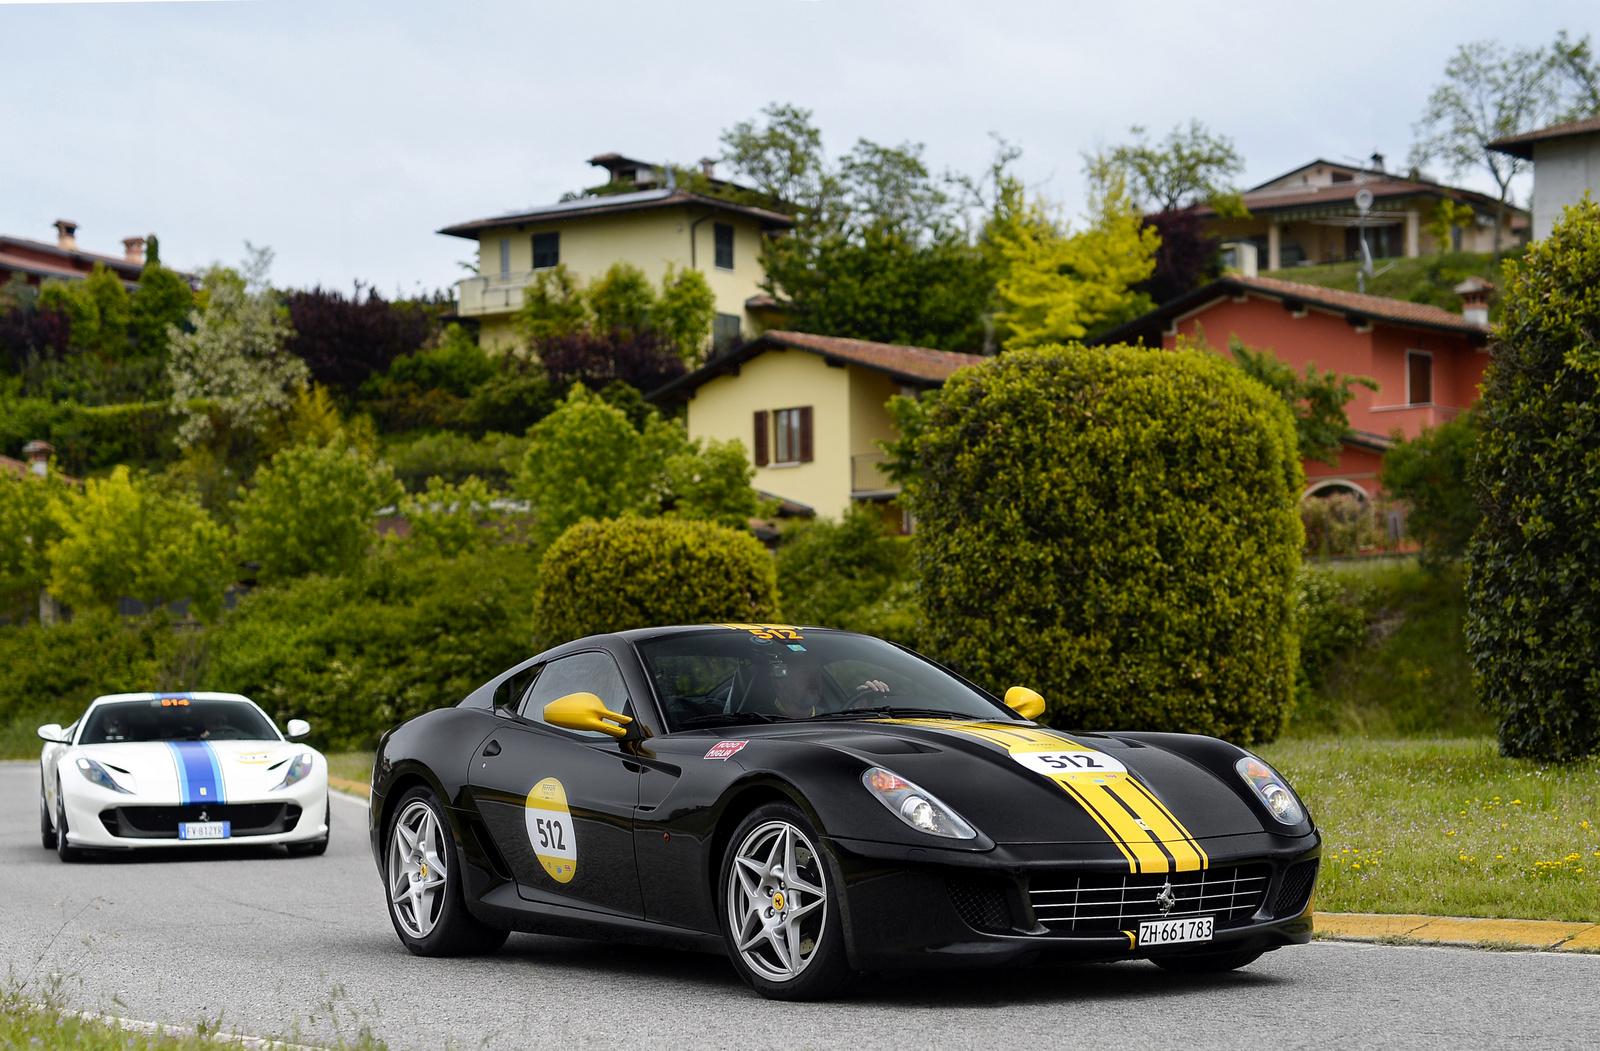 Ferrari 599 GTB Fiorano - Ferrari 812 Superfast